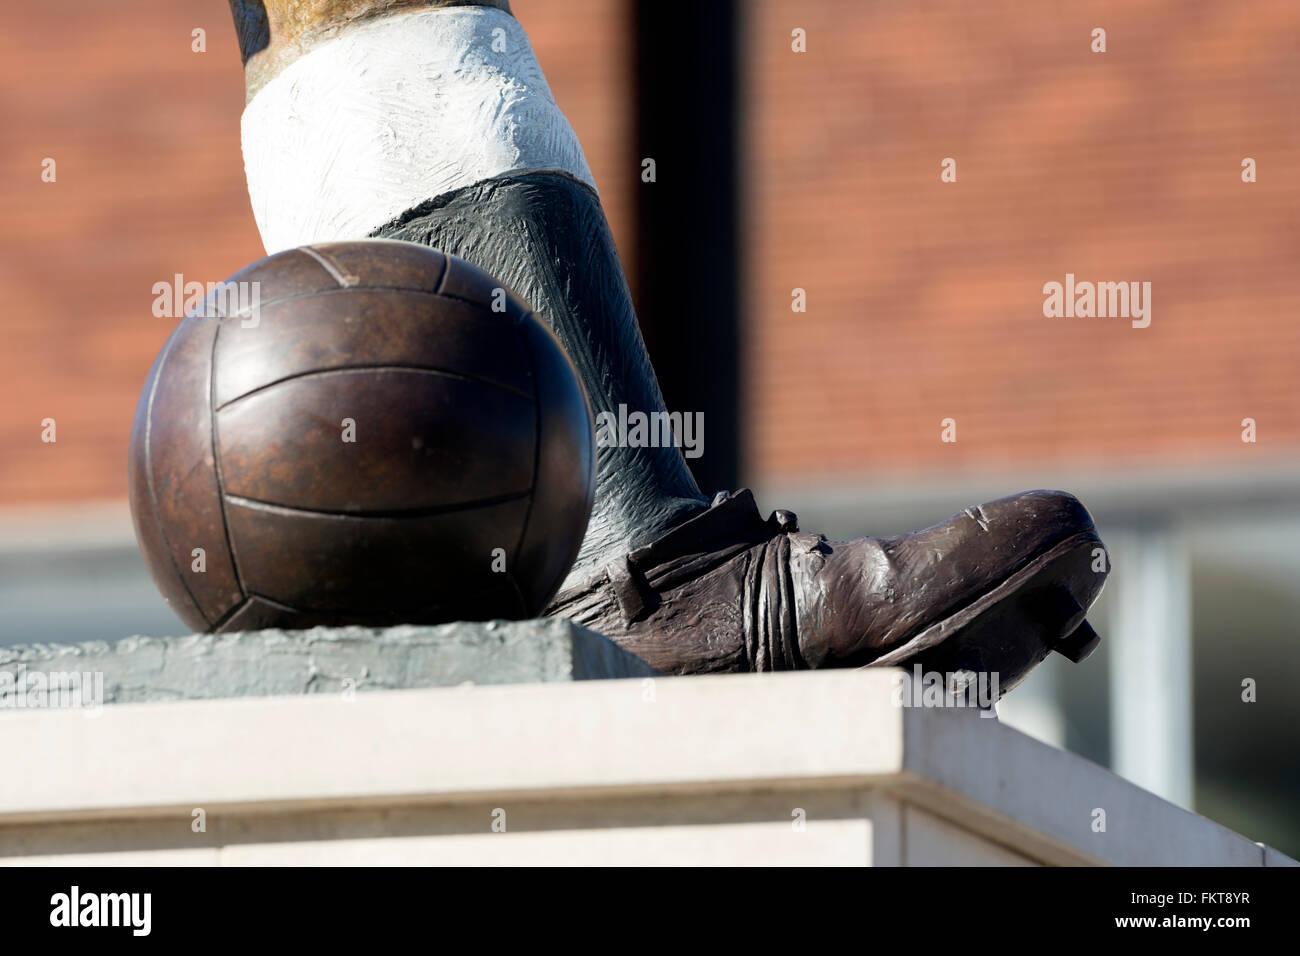 Duncan Edwards statue detail, Dudley town centre, West Midlands, England, UK - Stock Image